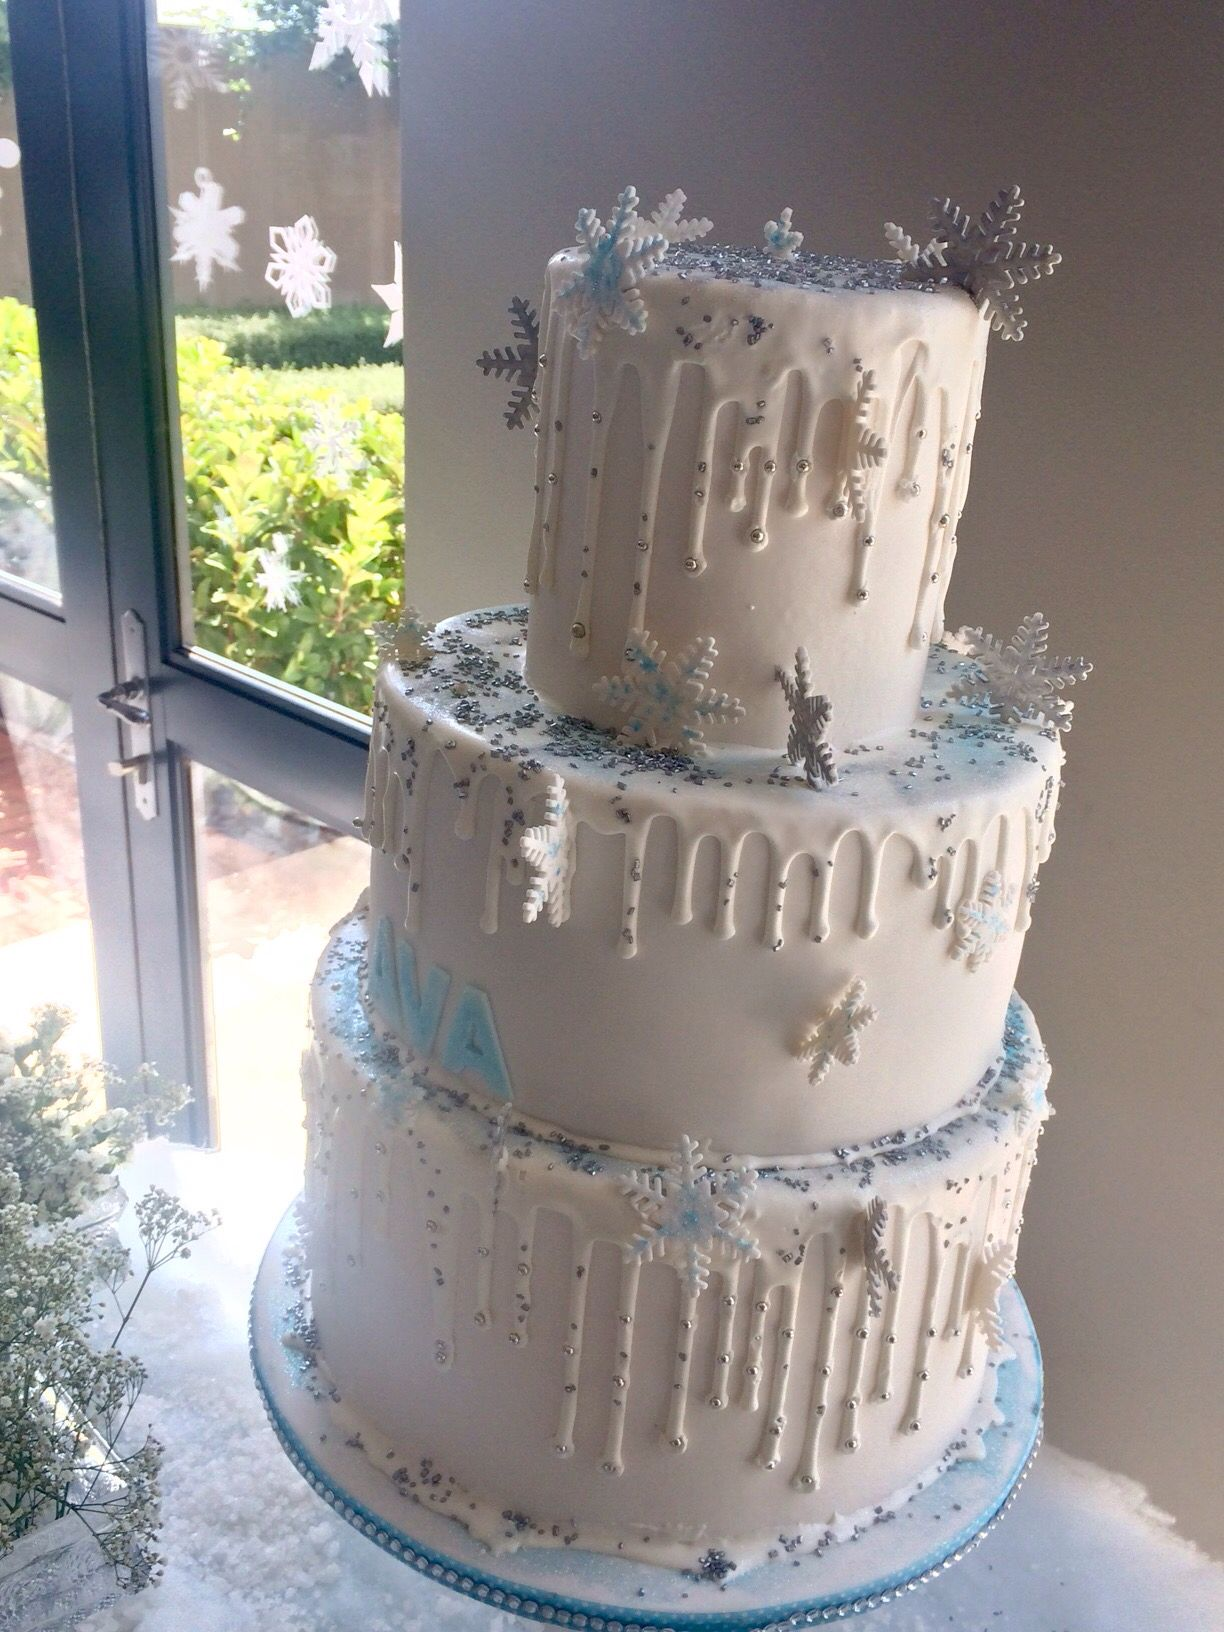 Snow themed birthday cake | Themed birthday cakes, Cake ...